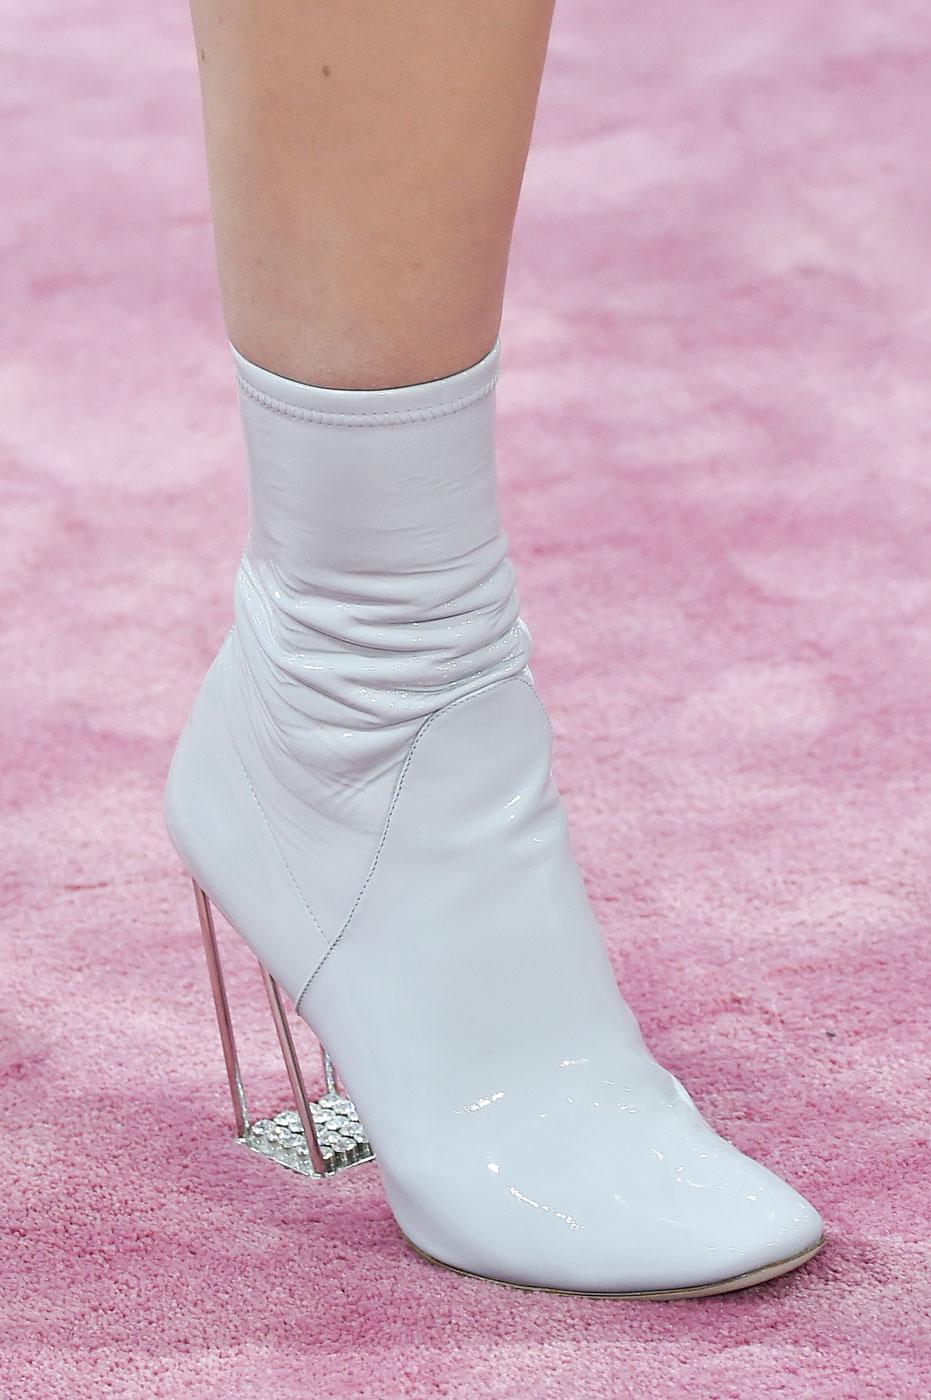 Christian-Dior-fashion-runway-show-close-ups-haute-couture-paris-spring-summer-2015-the-impression-082